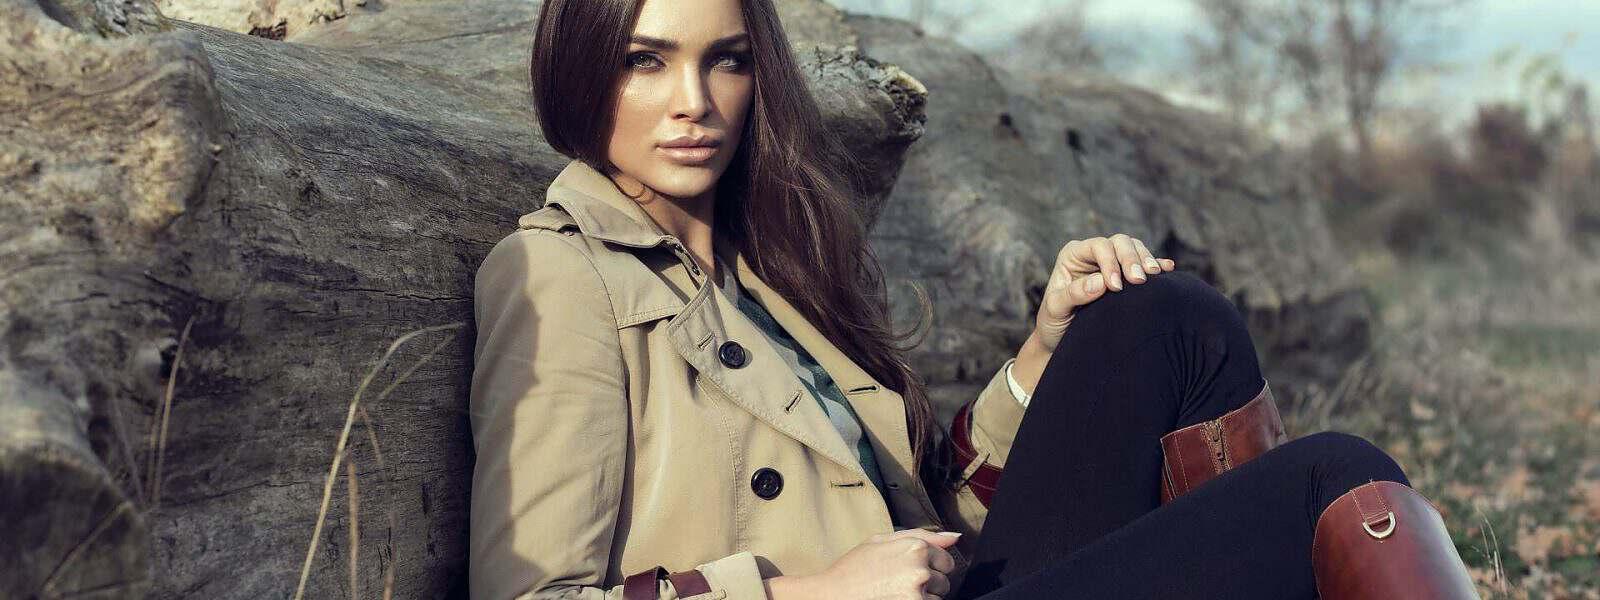 Fashion woman outdoor